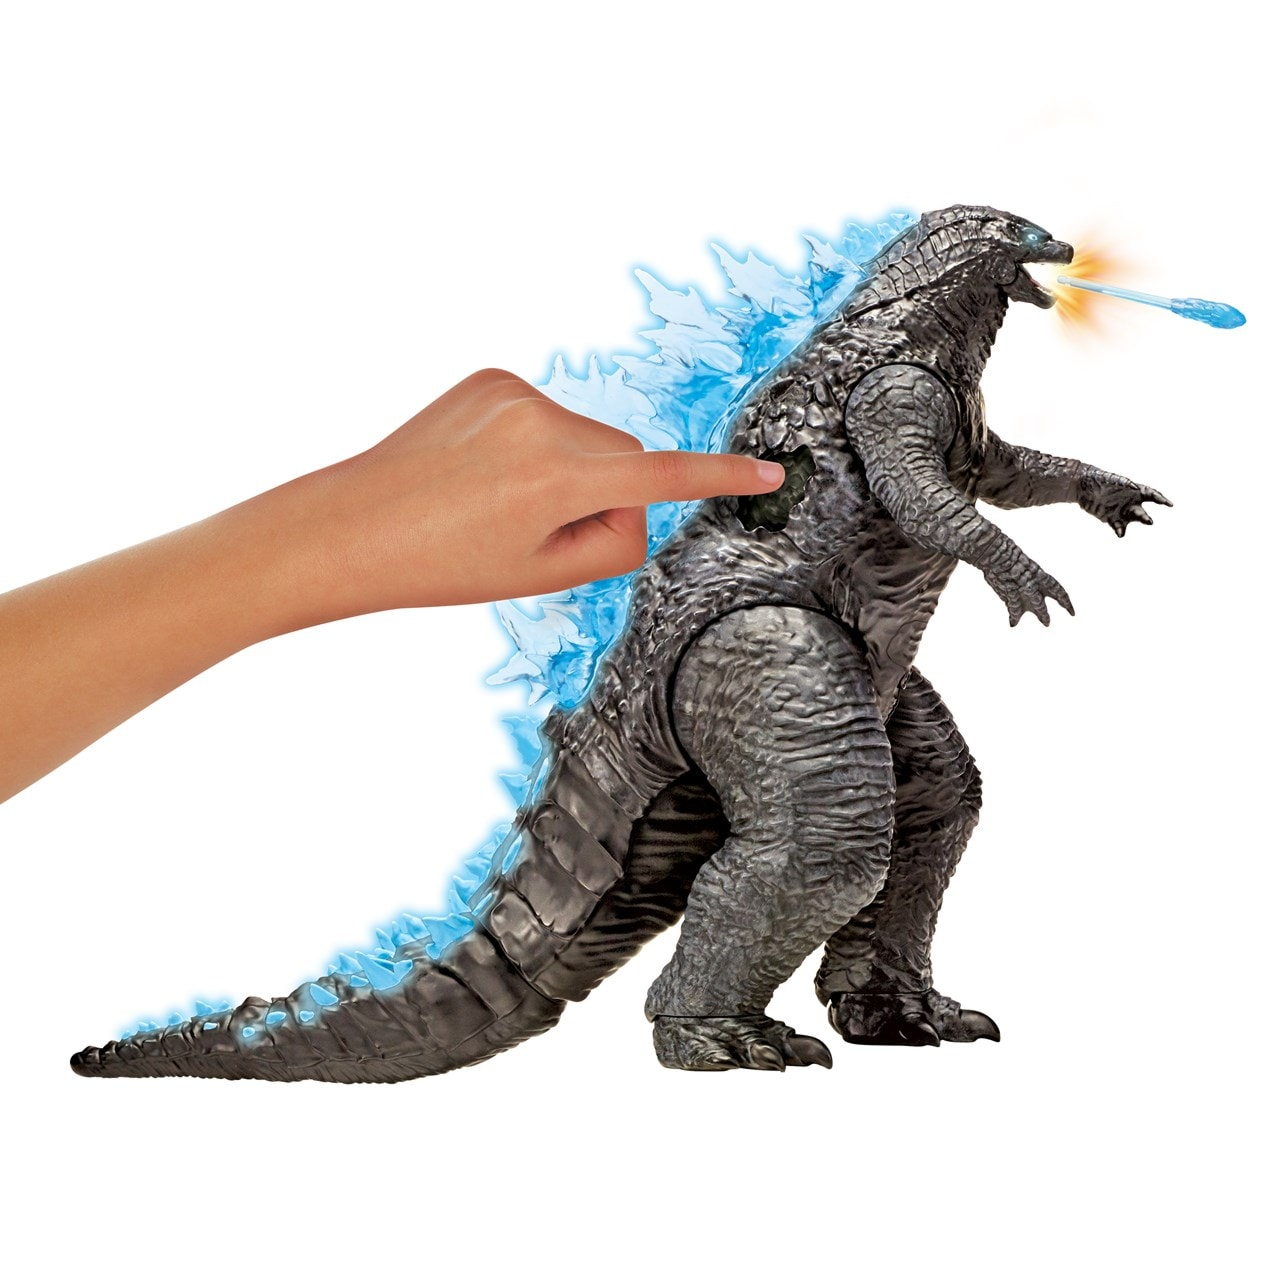 Monsterverse Godzilla vs Kong: Mega Godzilla with Lights & Sounds Action Figure - 2